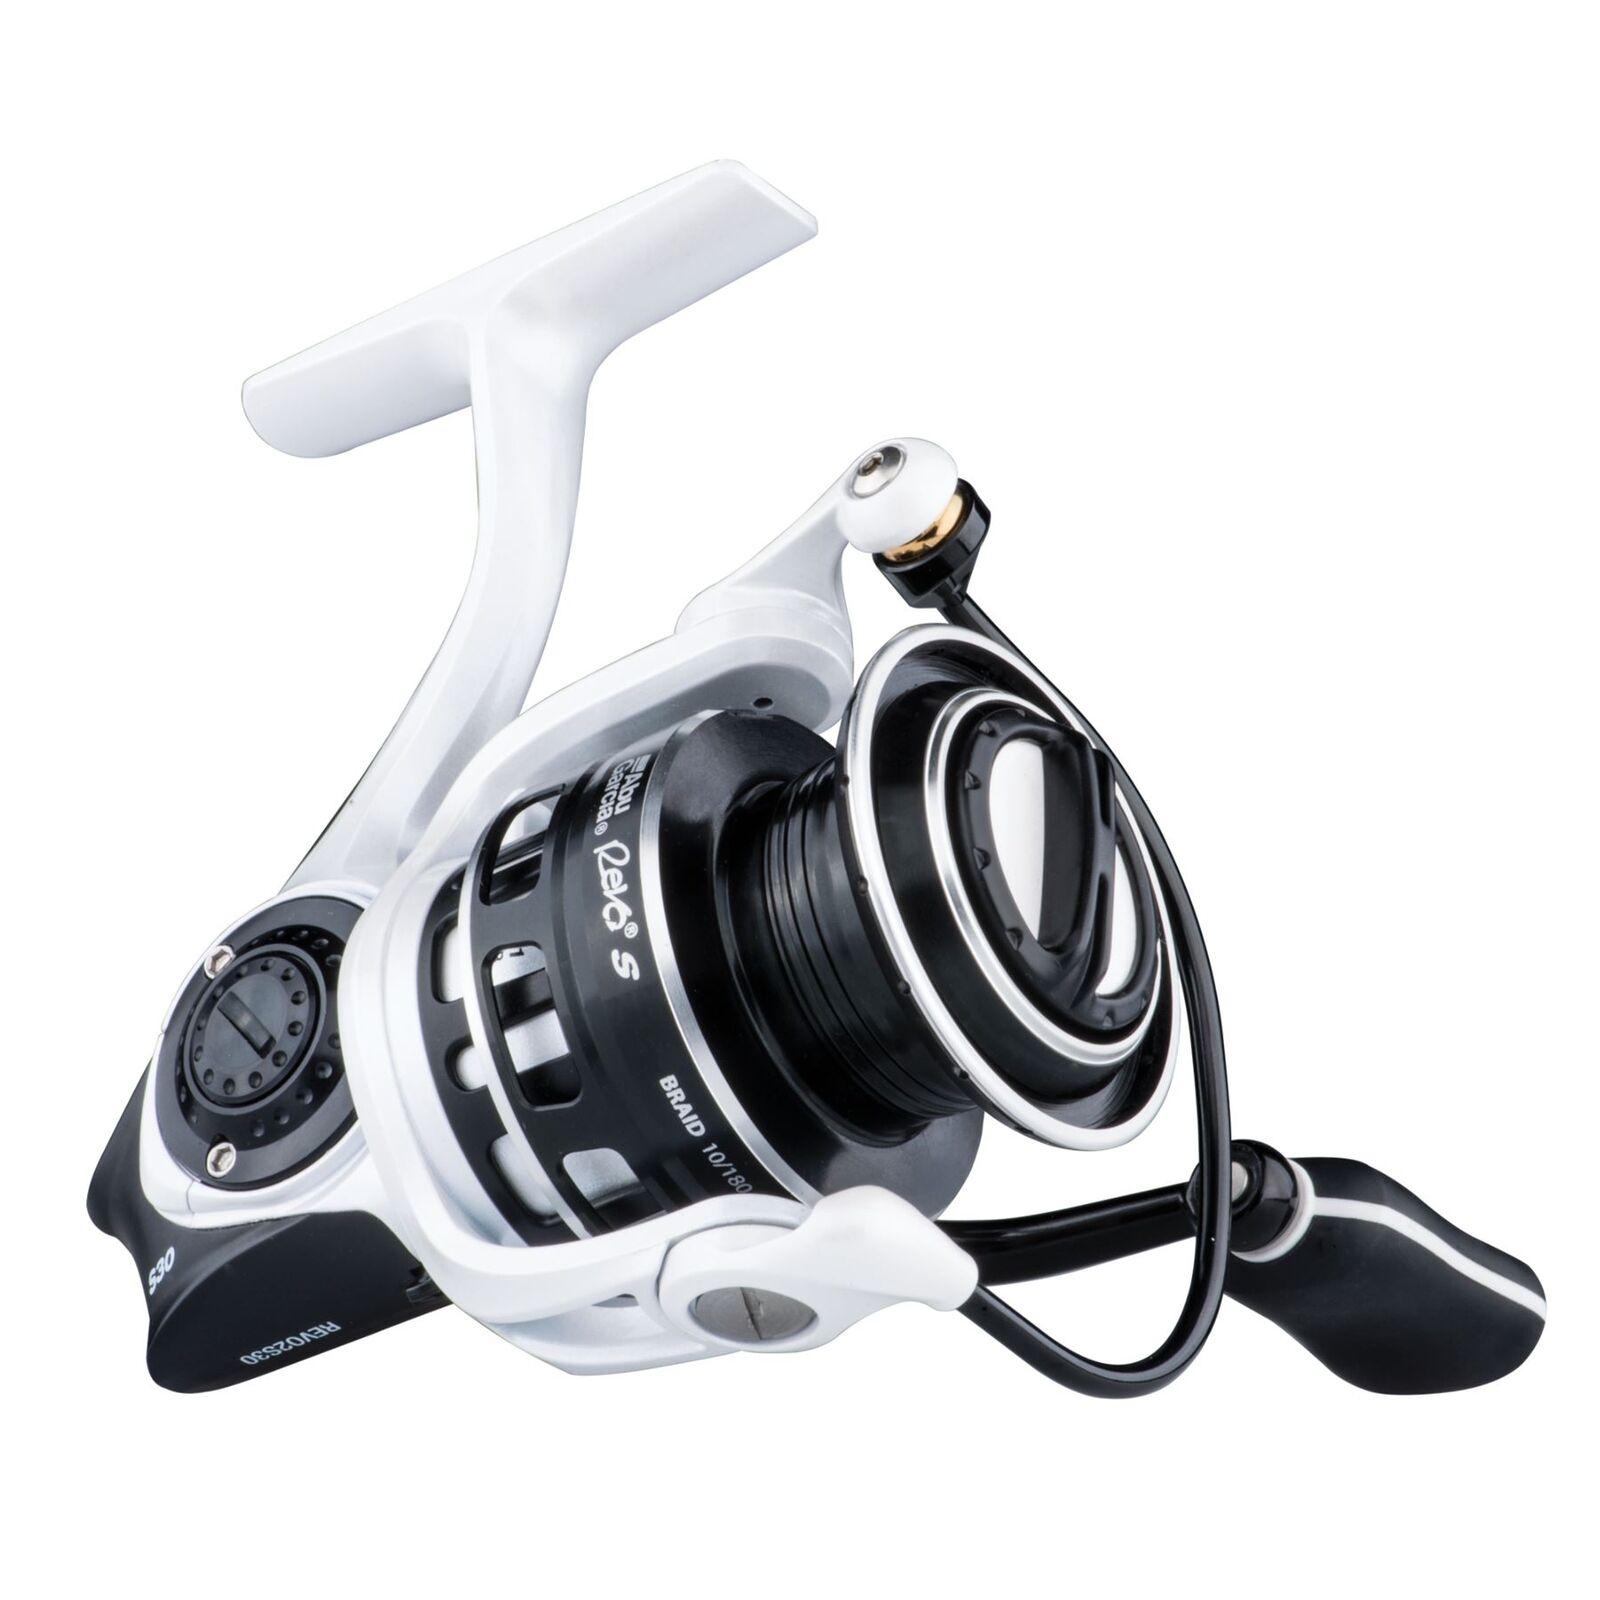 Abu Garcia Revo 2 S 10 Spinning Reel De Pesca